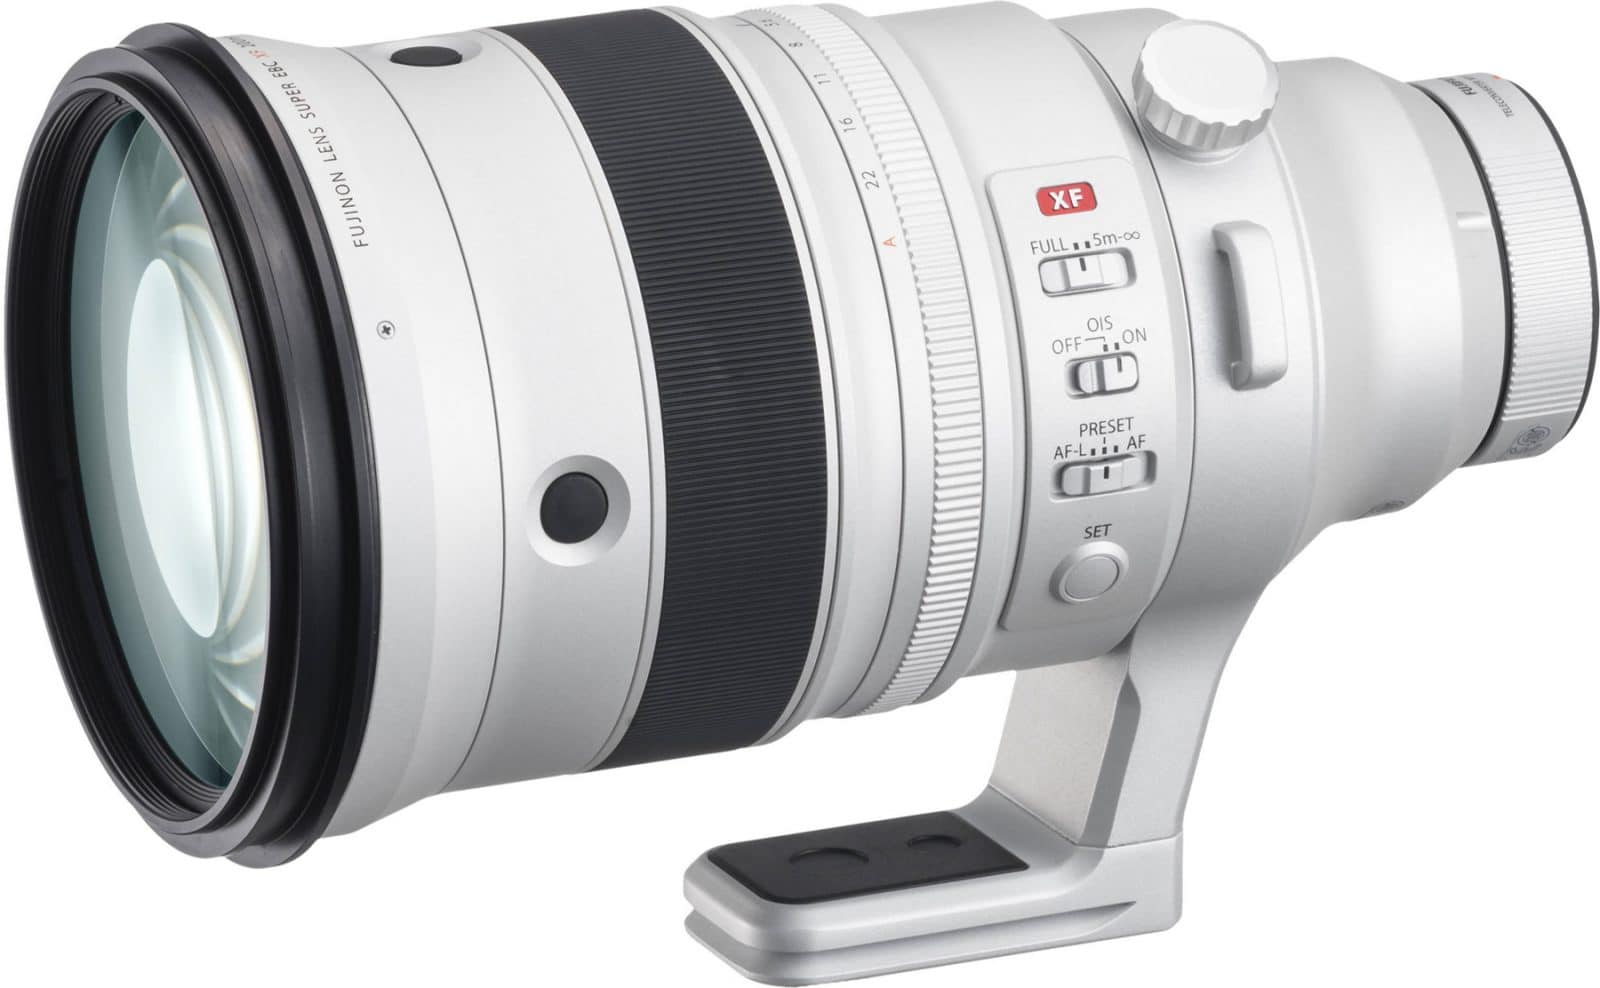 Fujifilm 200 mm F2